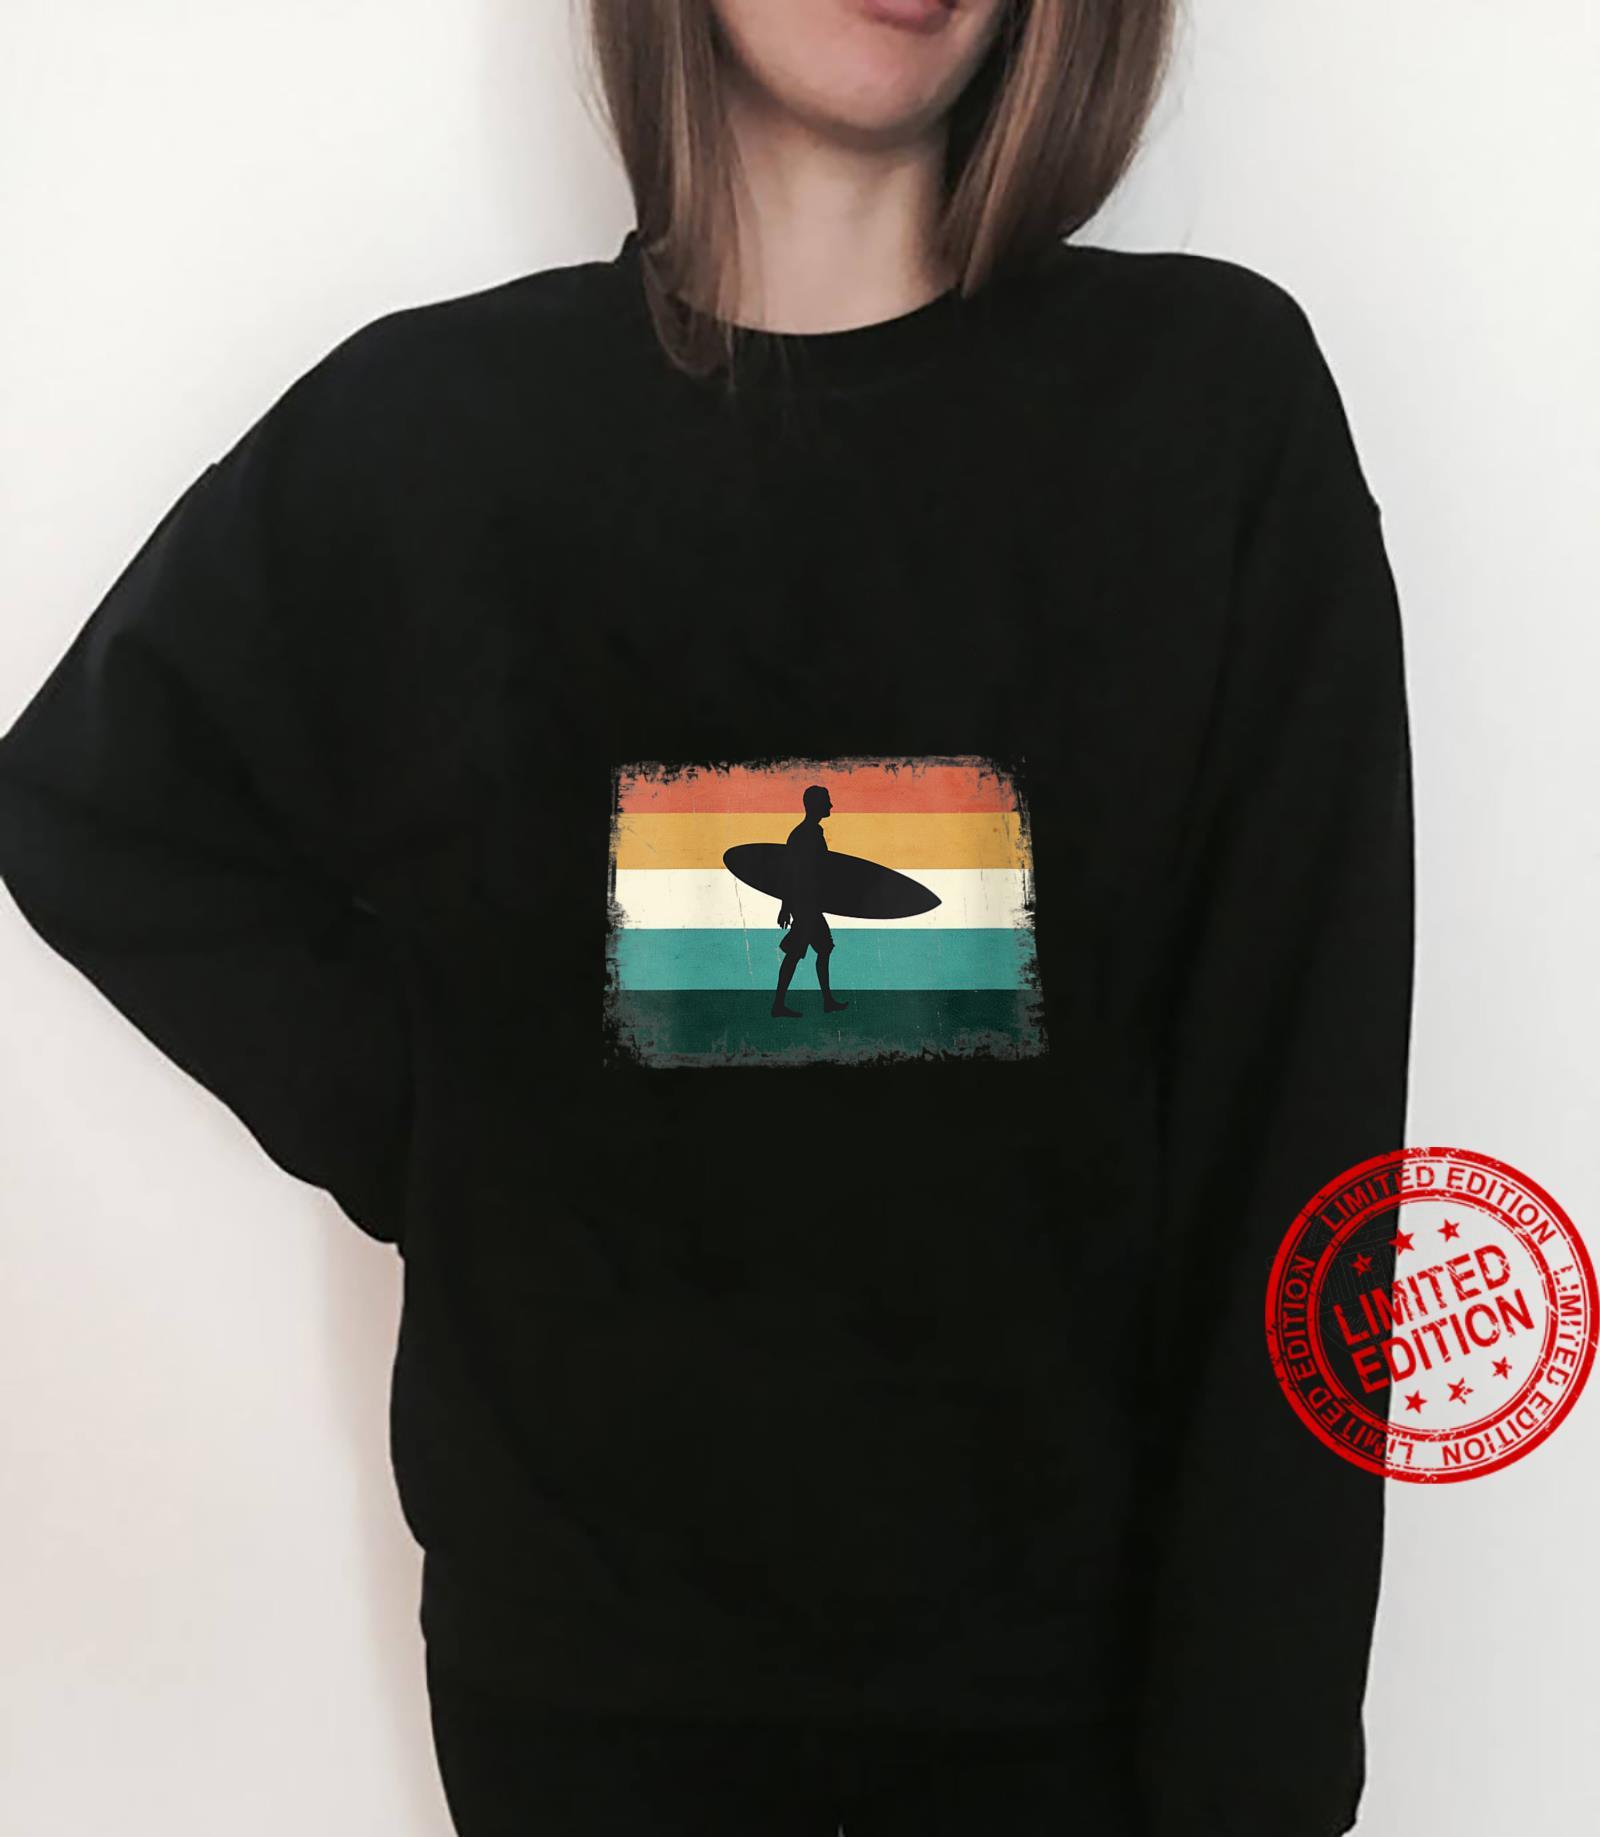 Womens Retro Sunset Surfer Vintage Surfing Beach Sun & Surf Shirt sweater